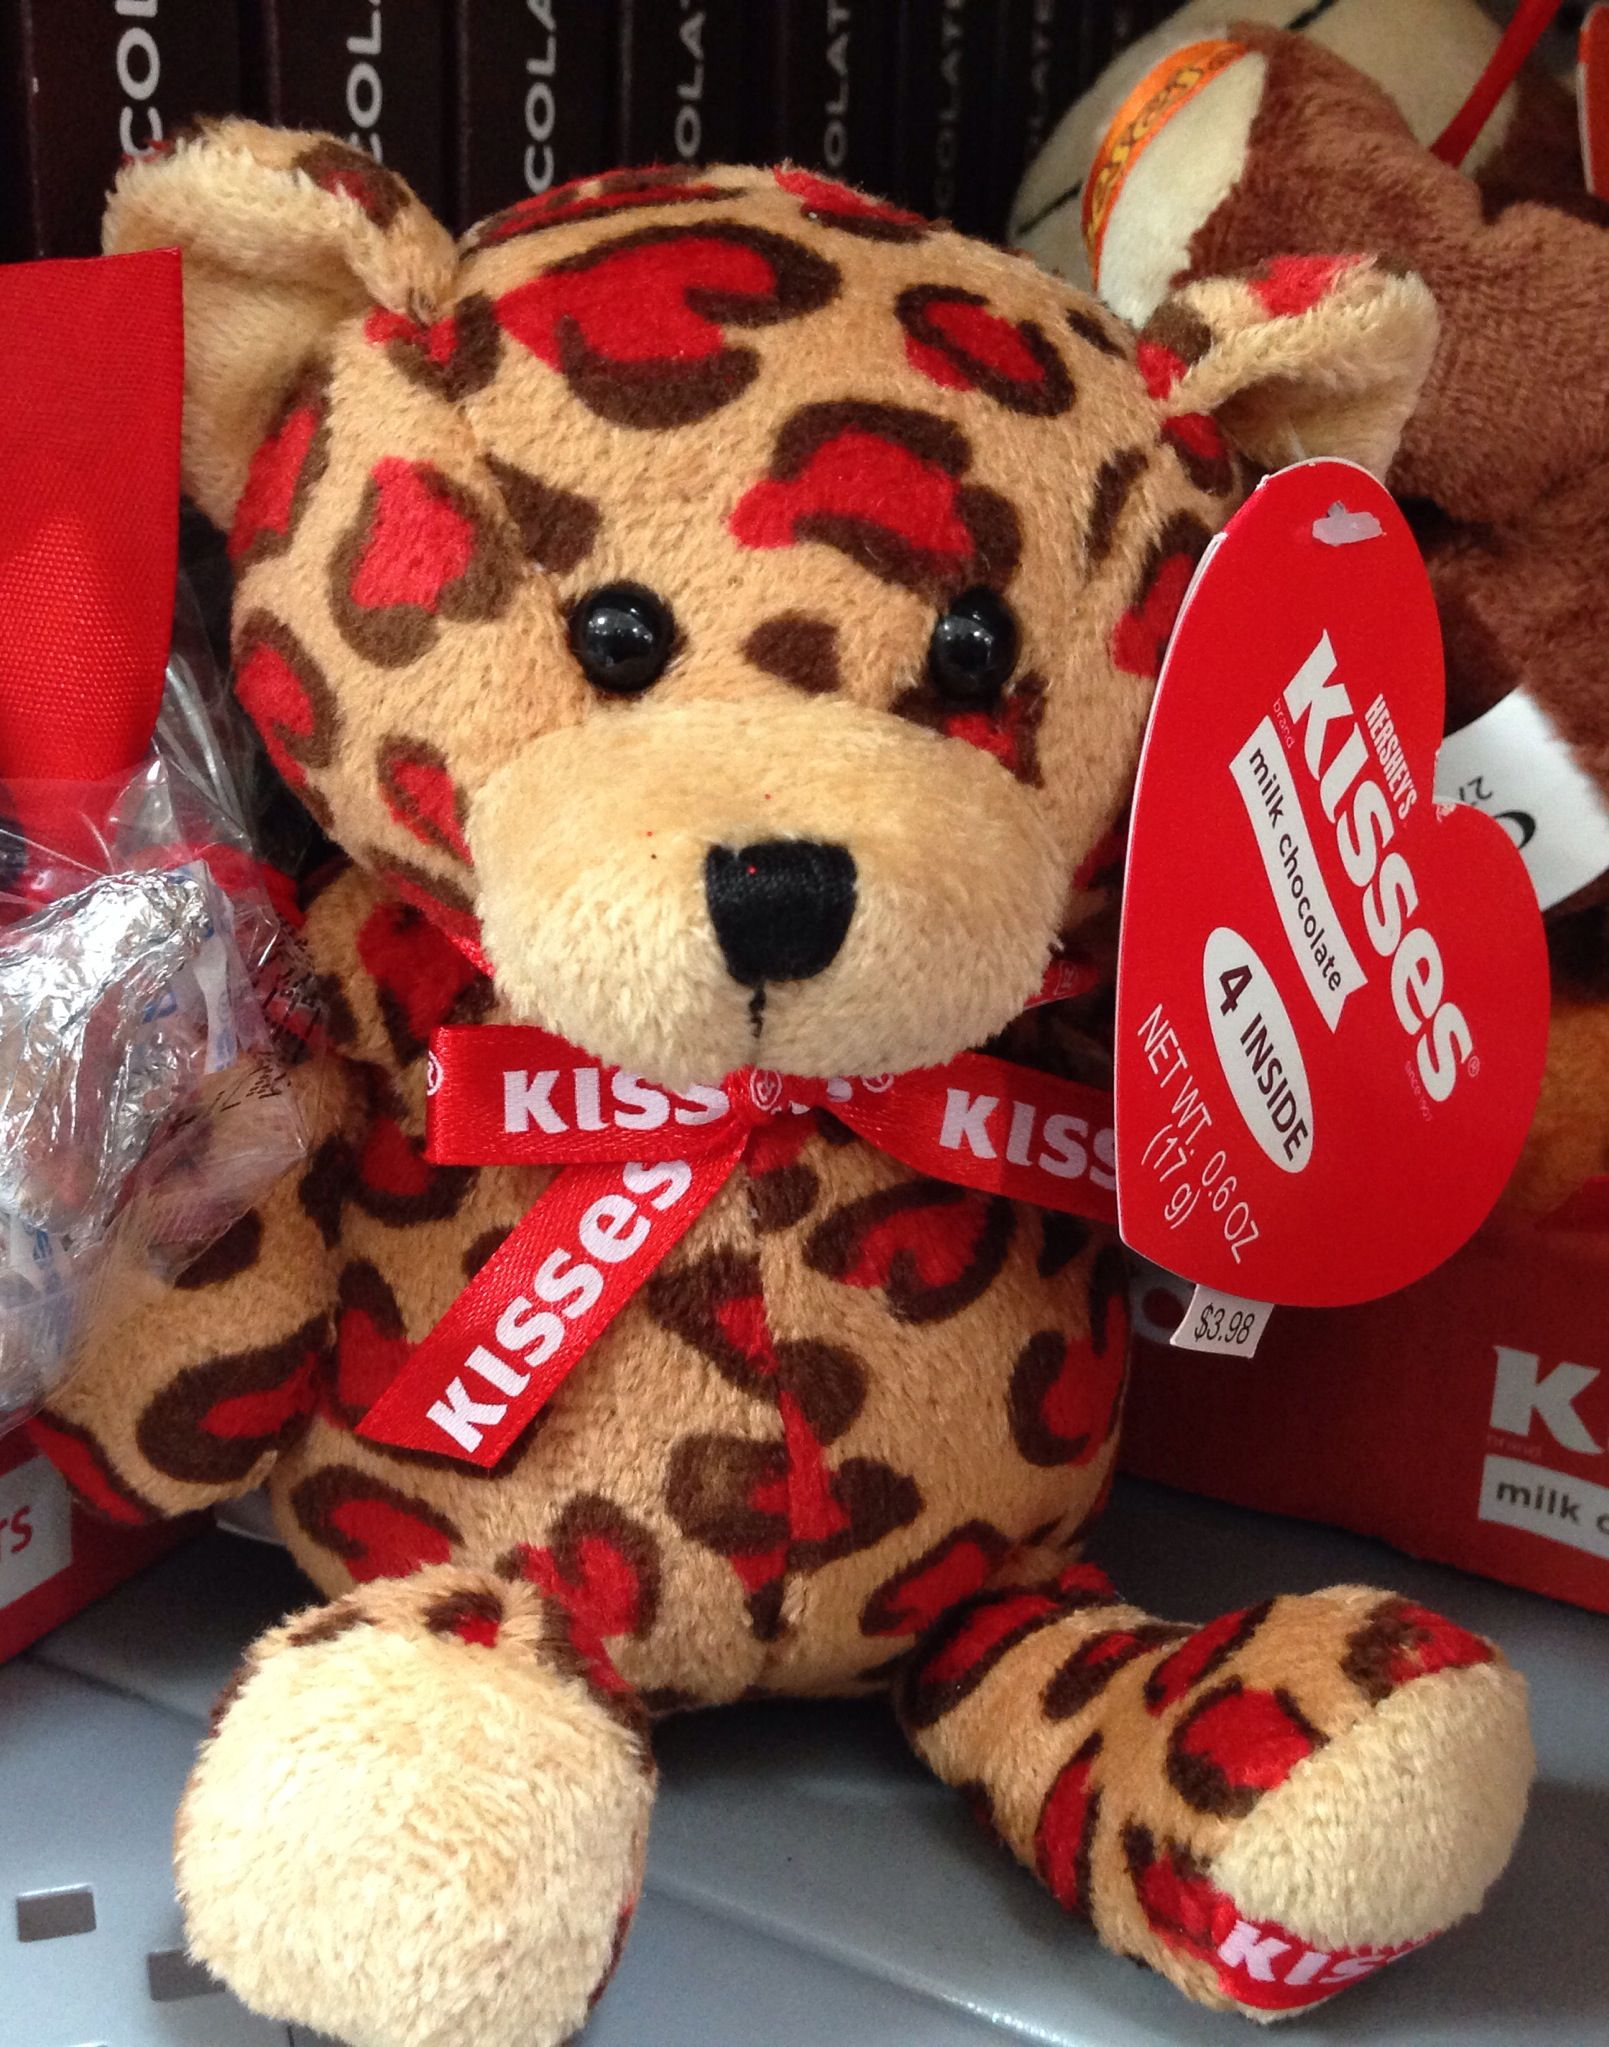 Stuffed Animal/Leopard Print/Walmart/Valentine/Hersheyu0027s Kisses